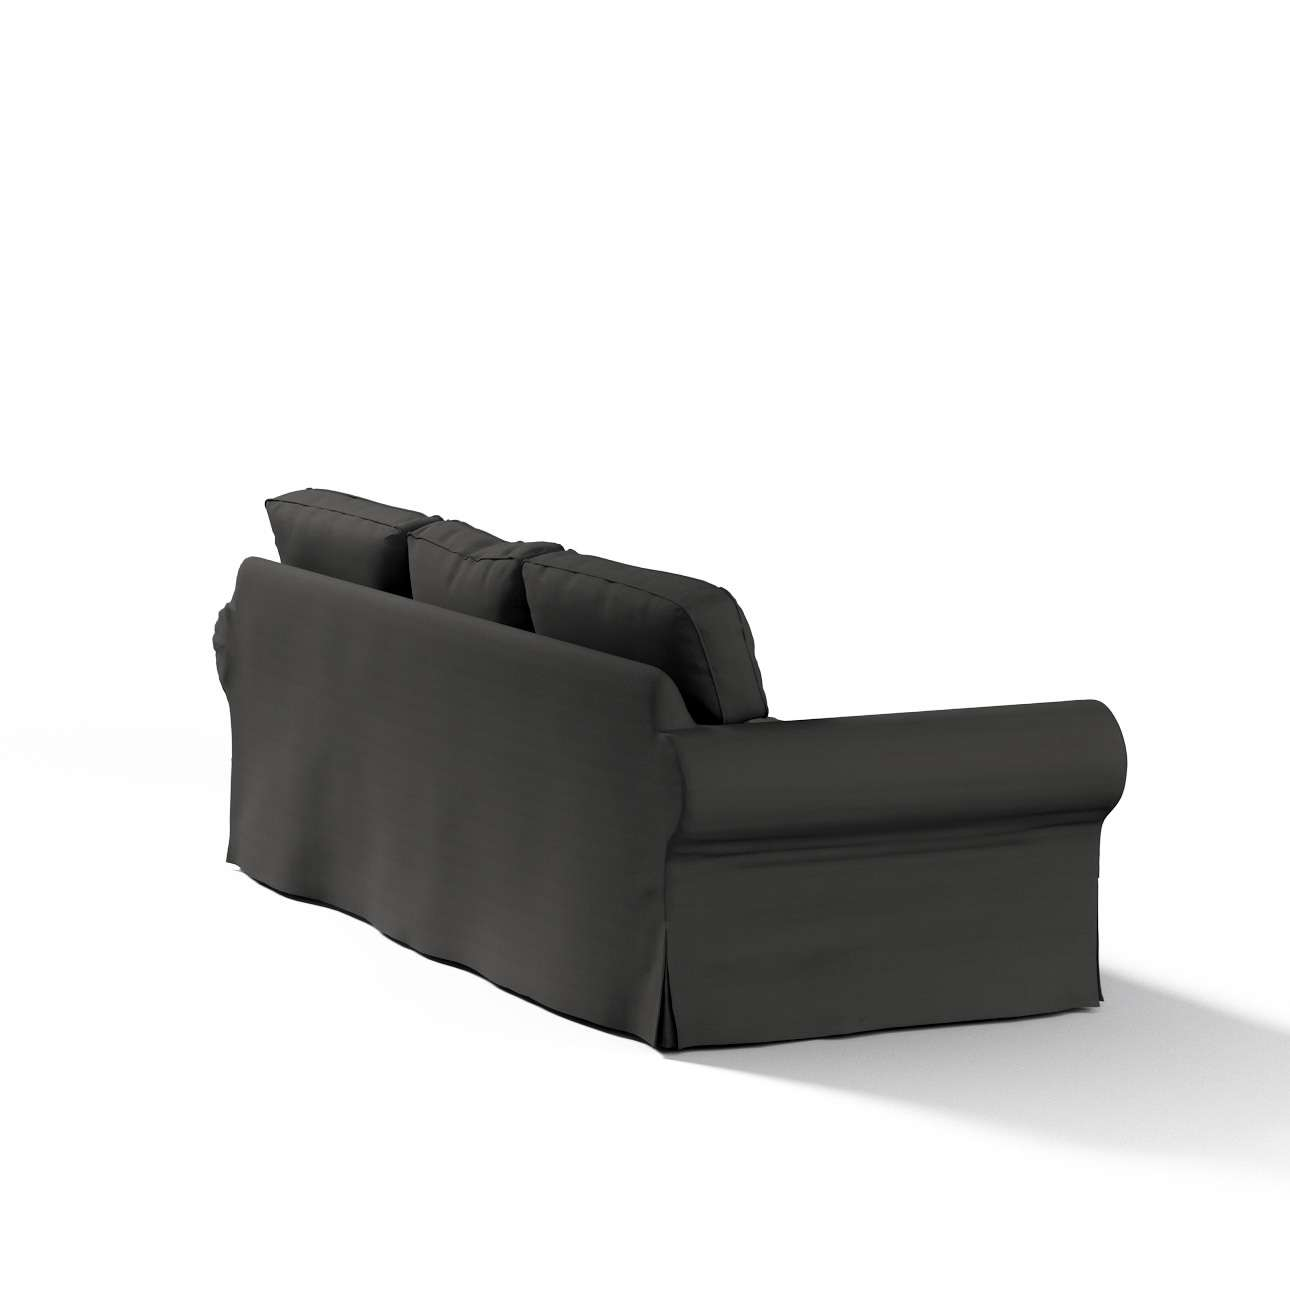 Ektorp 3-Sitzer Schlafsofabezug neues Modell (2013) Ektorp 3-Sitzer, ausklappbar, neues Modell ( 2013) von der Kollektion Cotton Panama, Stoff: 702-08